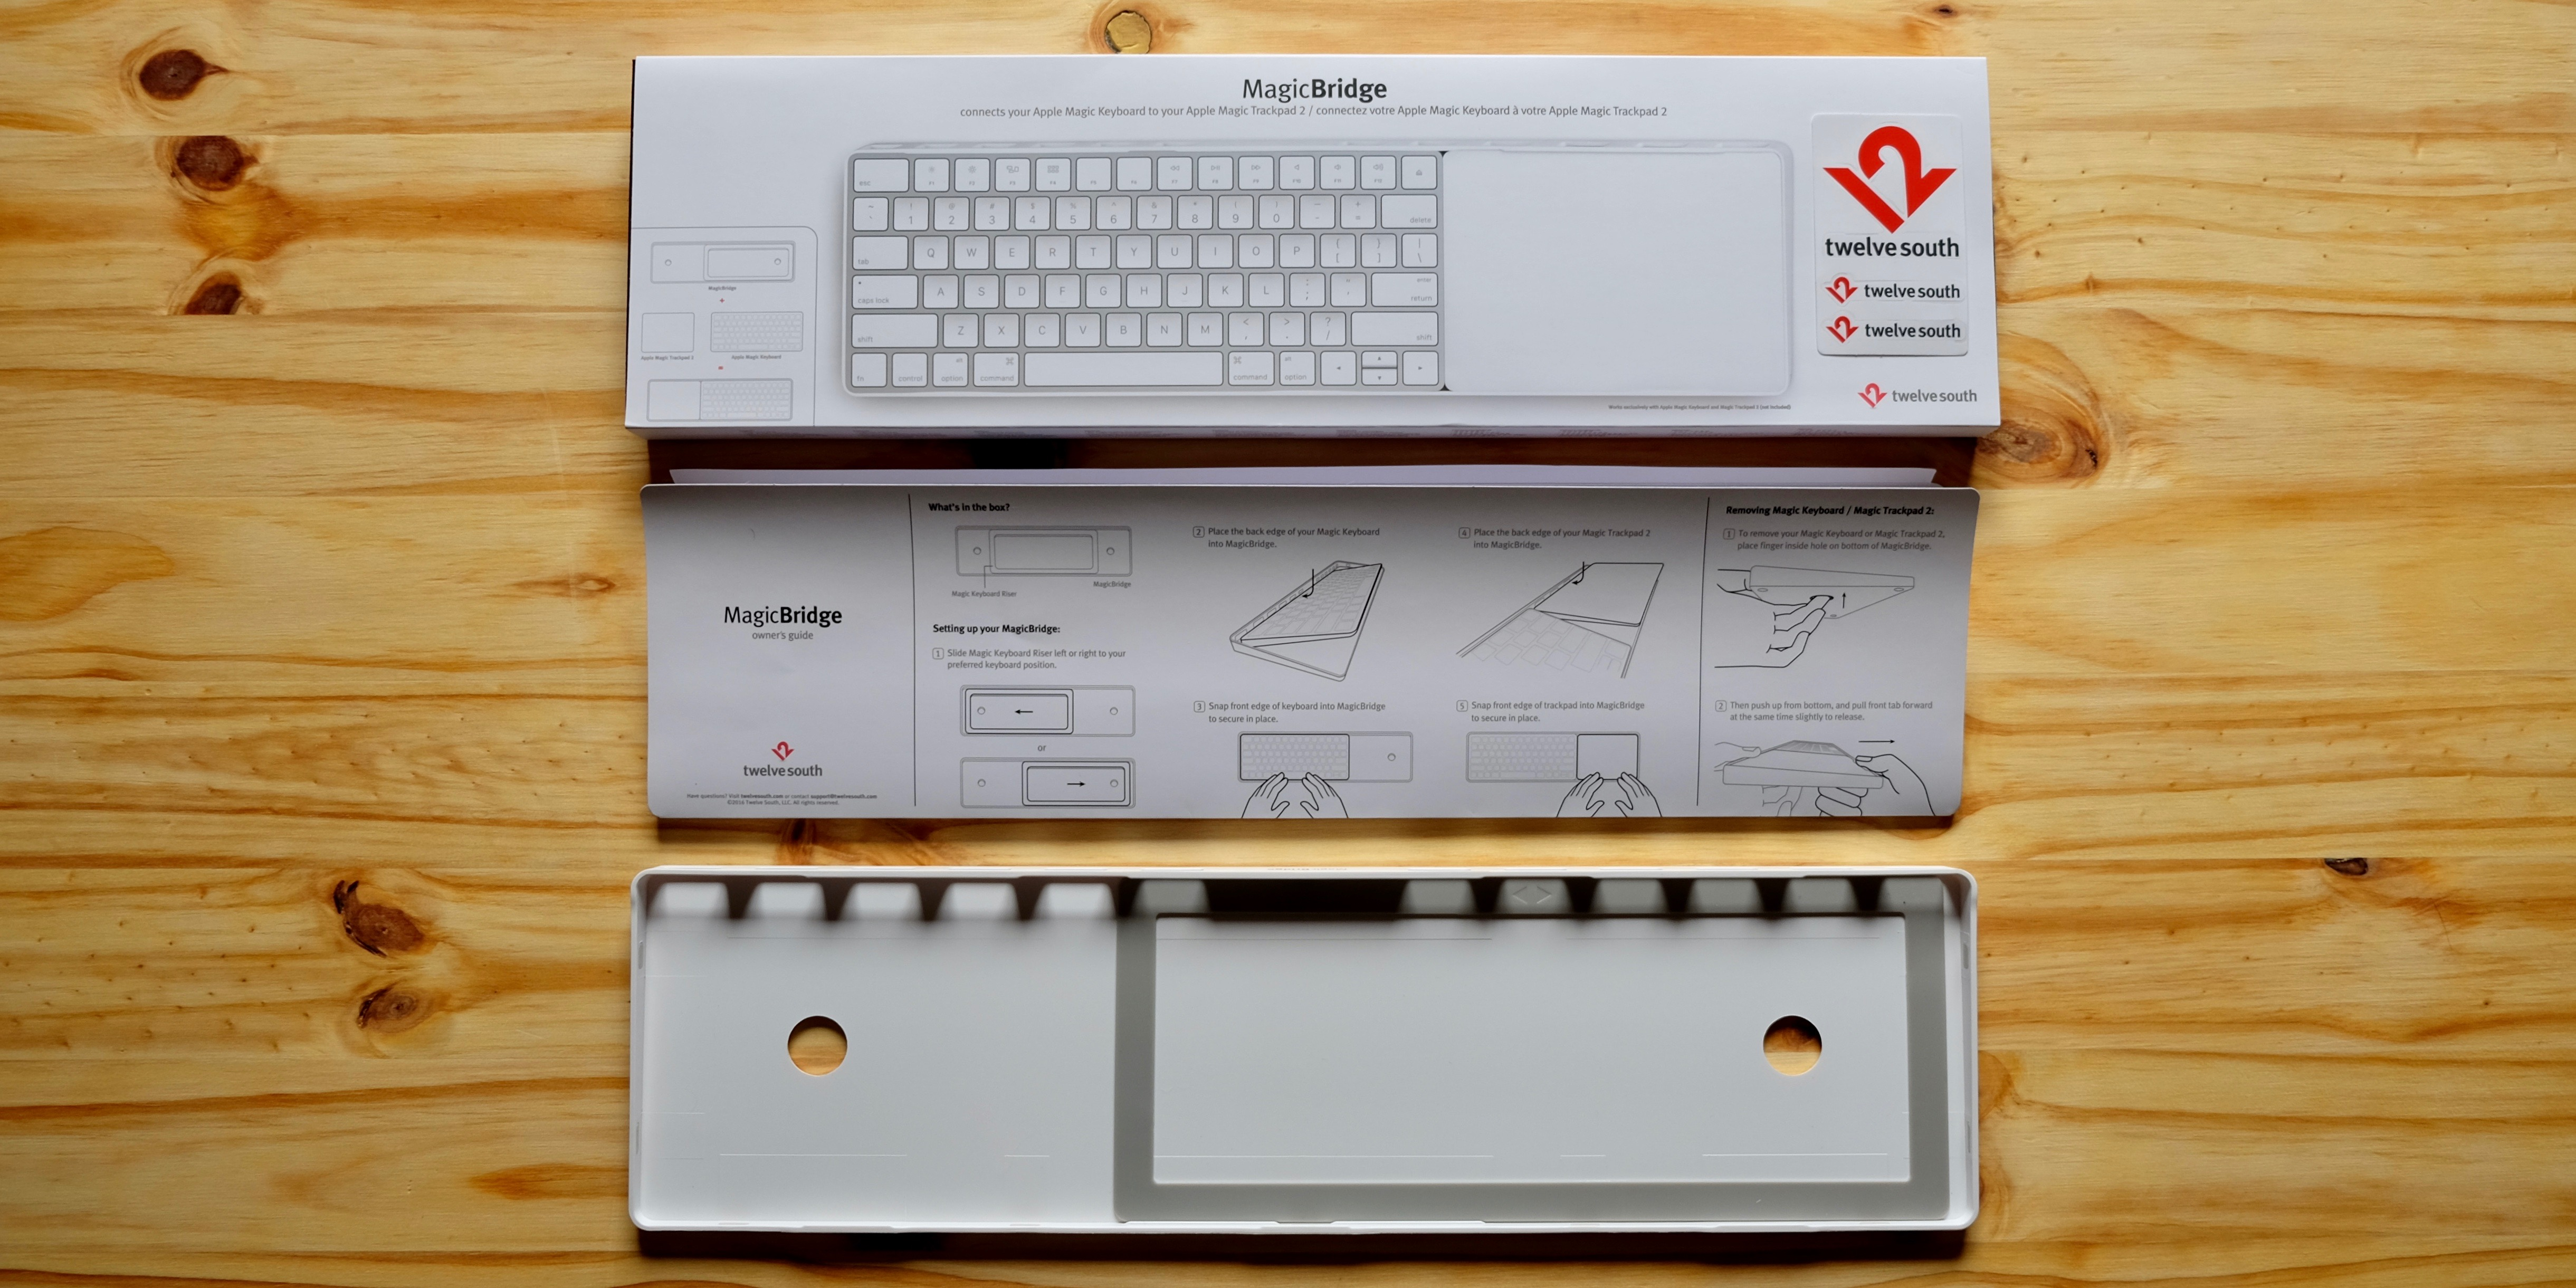 MagicBridge Magic keyboard and Magic Trackpad 2 accessory